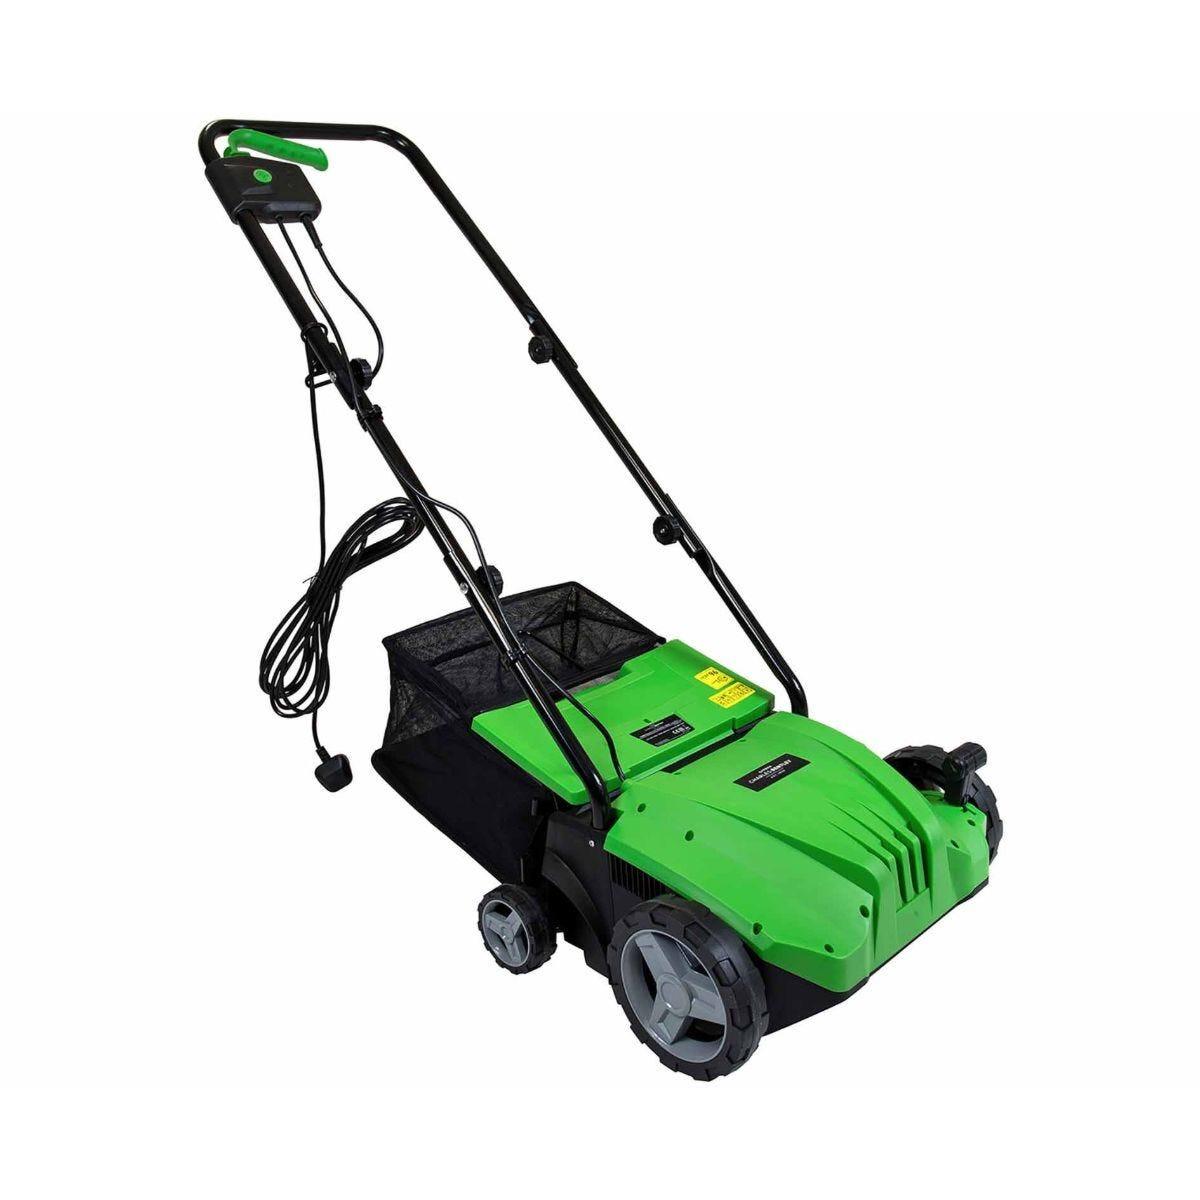 Charles Bentley Garden Scarifier and Aerator Lawn Rake